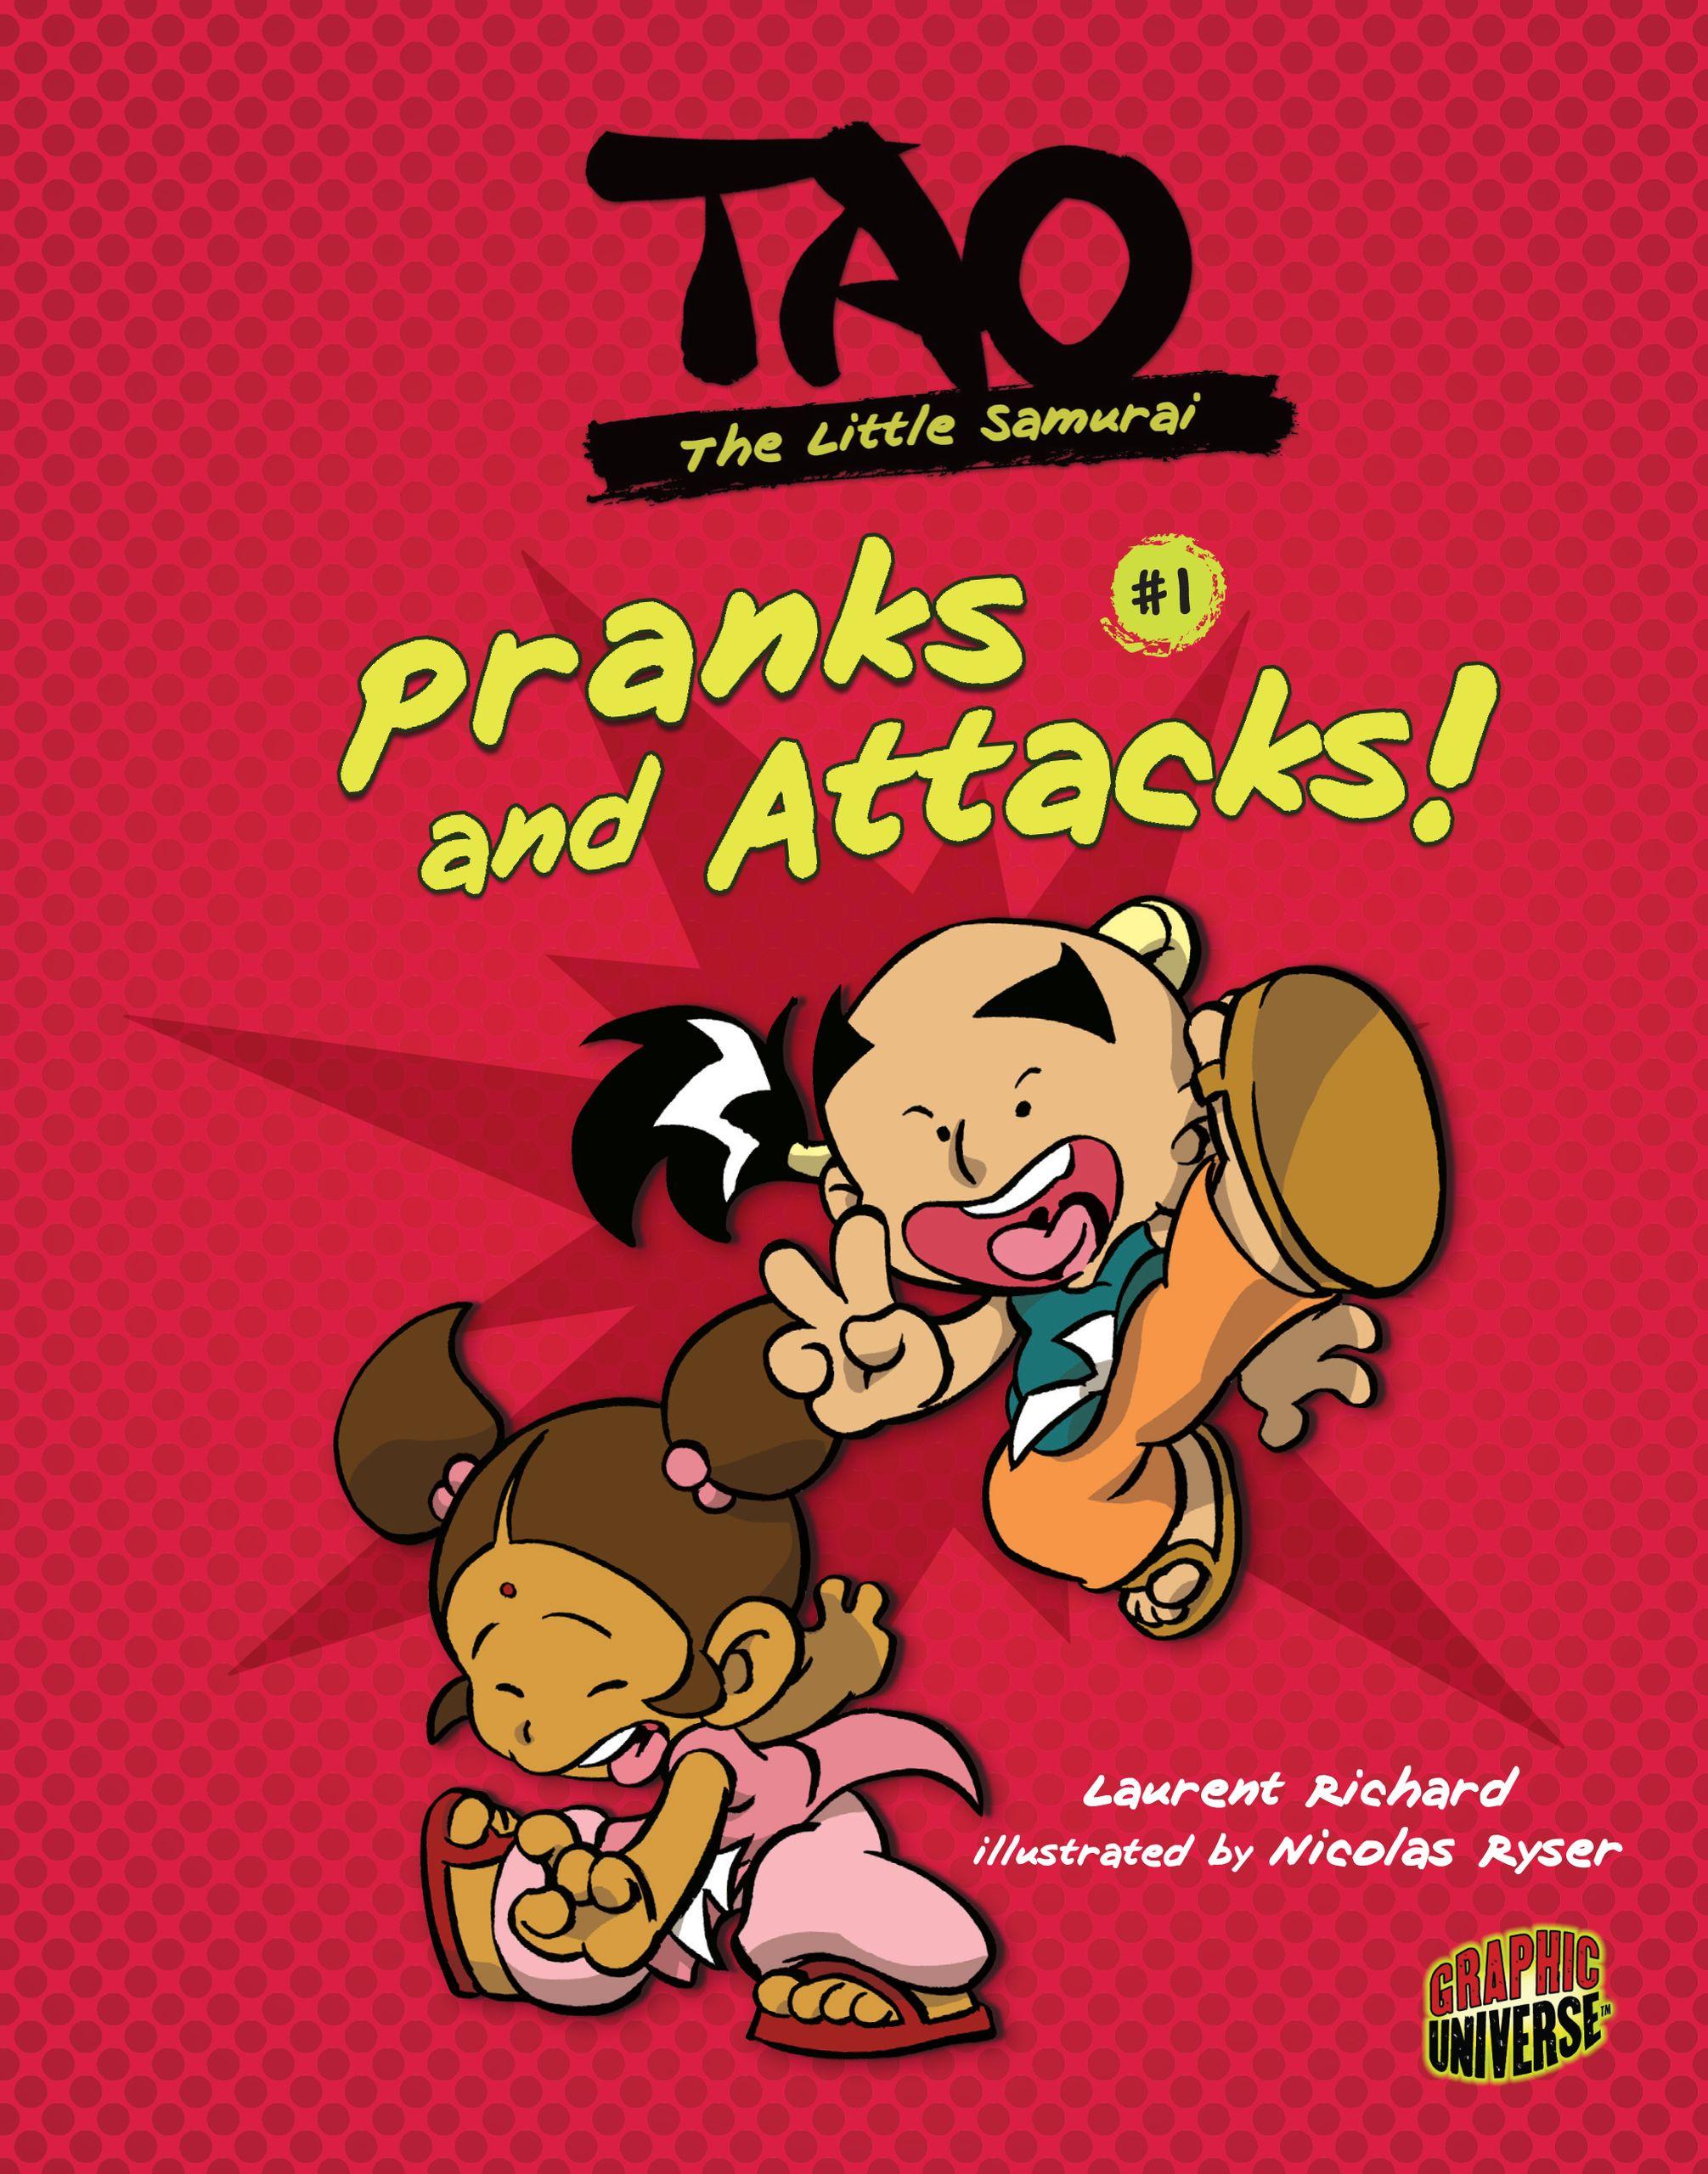 #1 Pranks and Attacks!